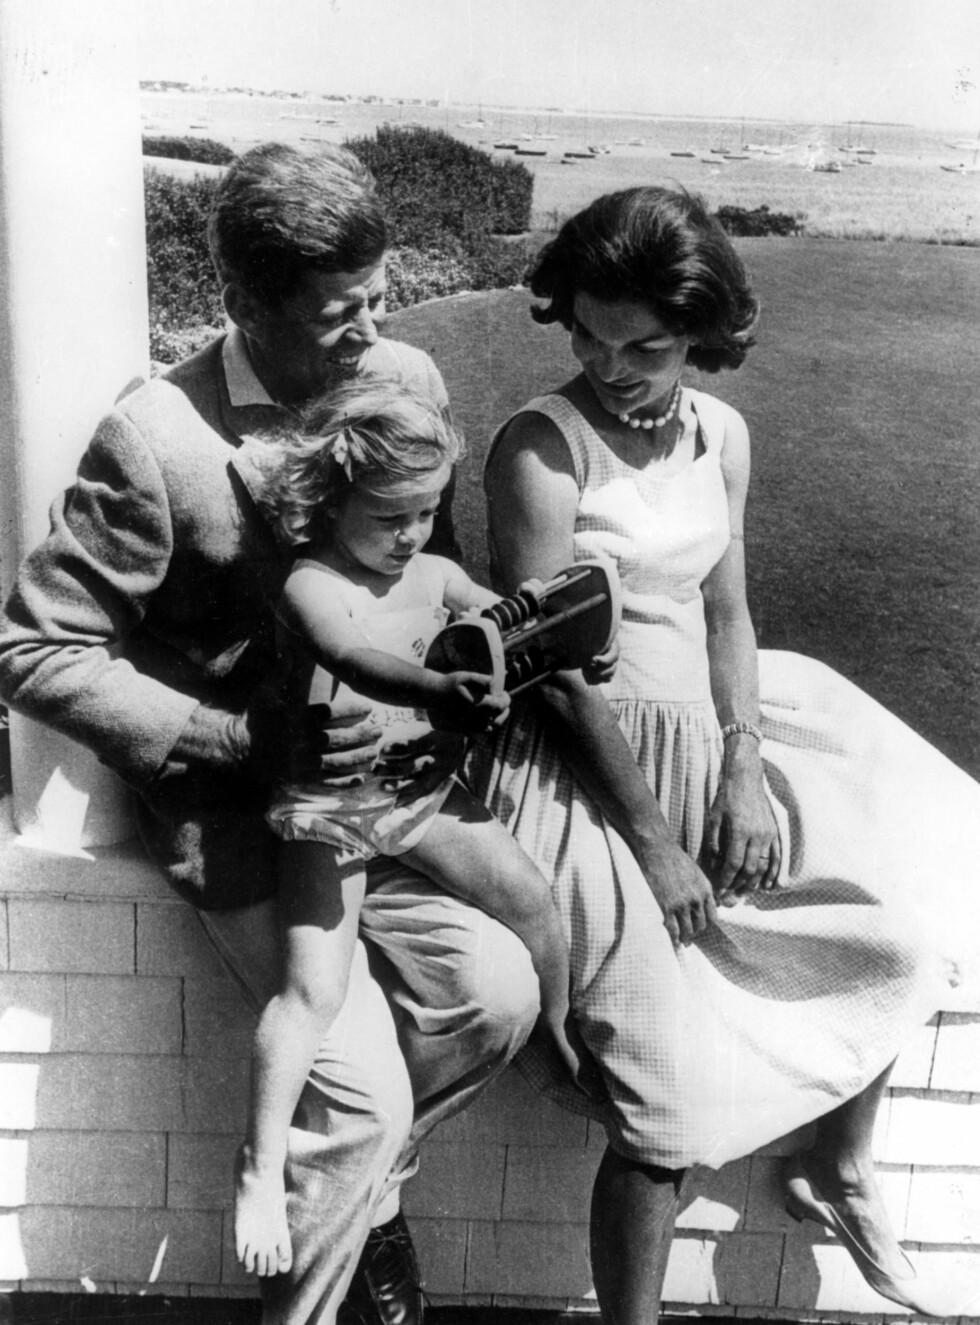 1962: John F. Kennedy og Jackie Kennedy med datteren Caroline. Foto: Zuma press